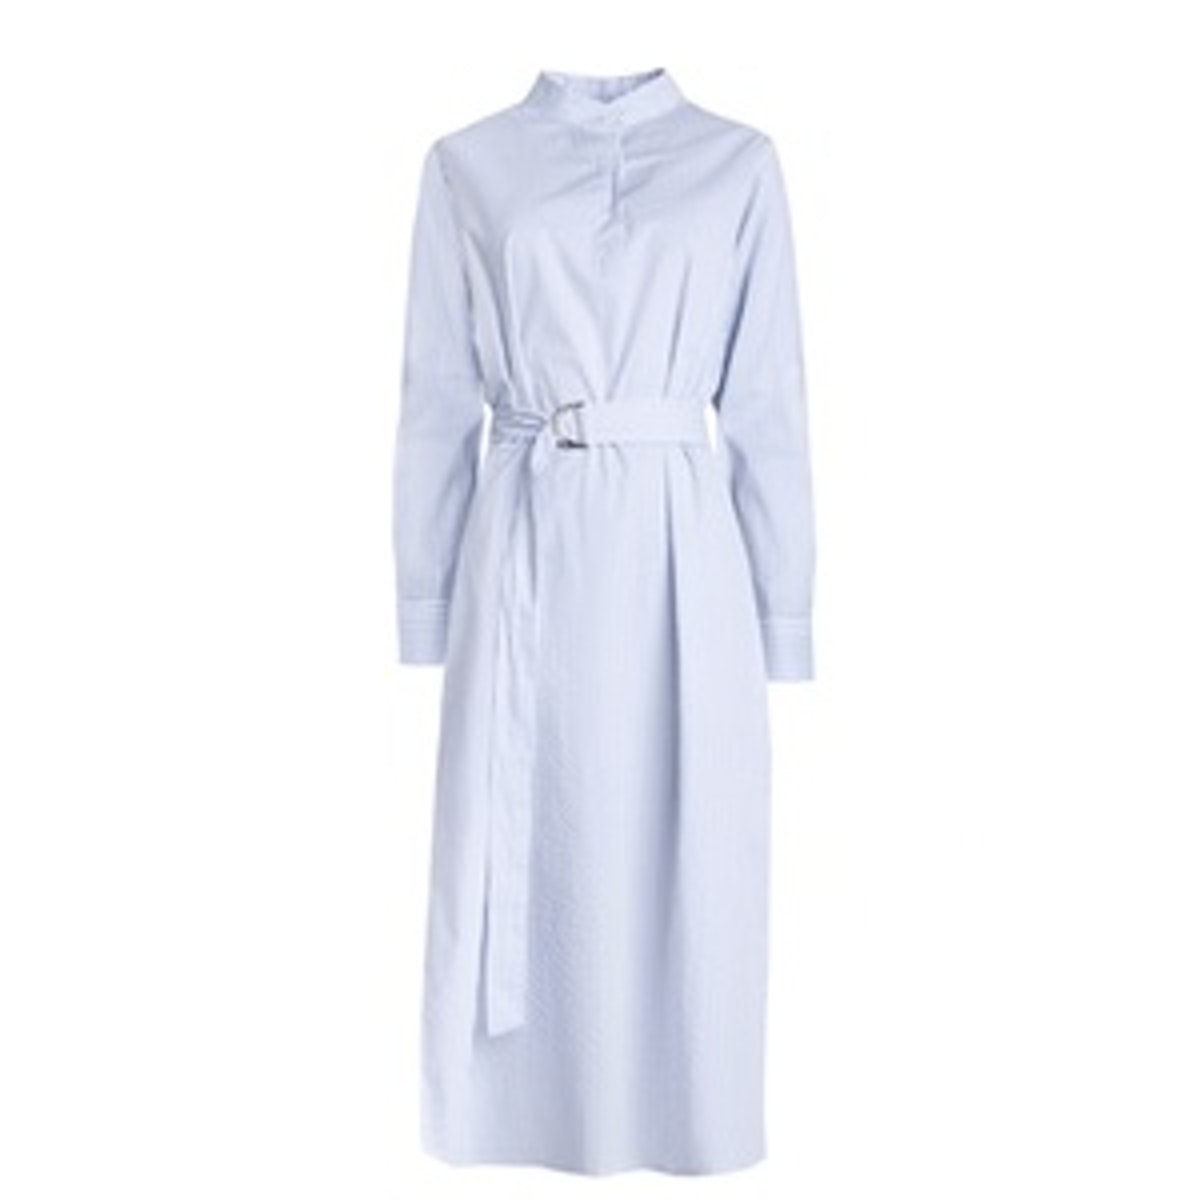 Long Striped Belted Shirt Dress